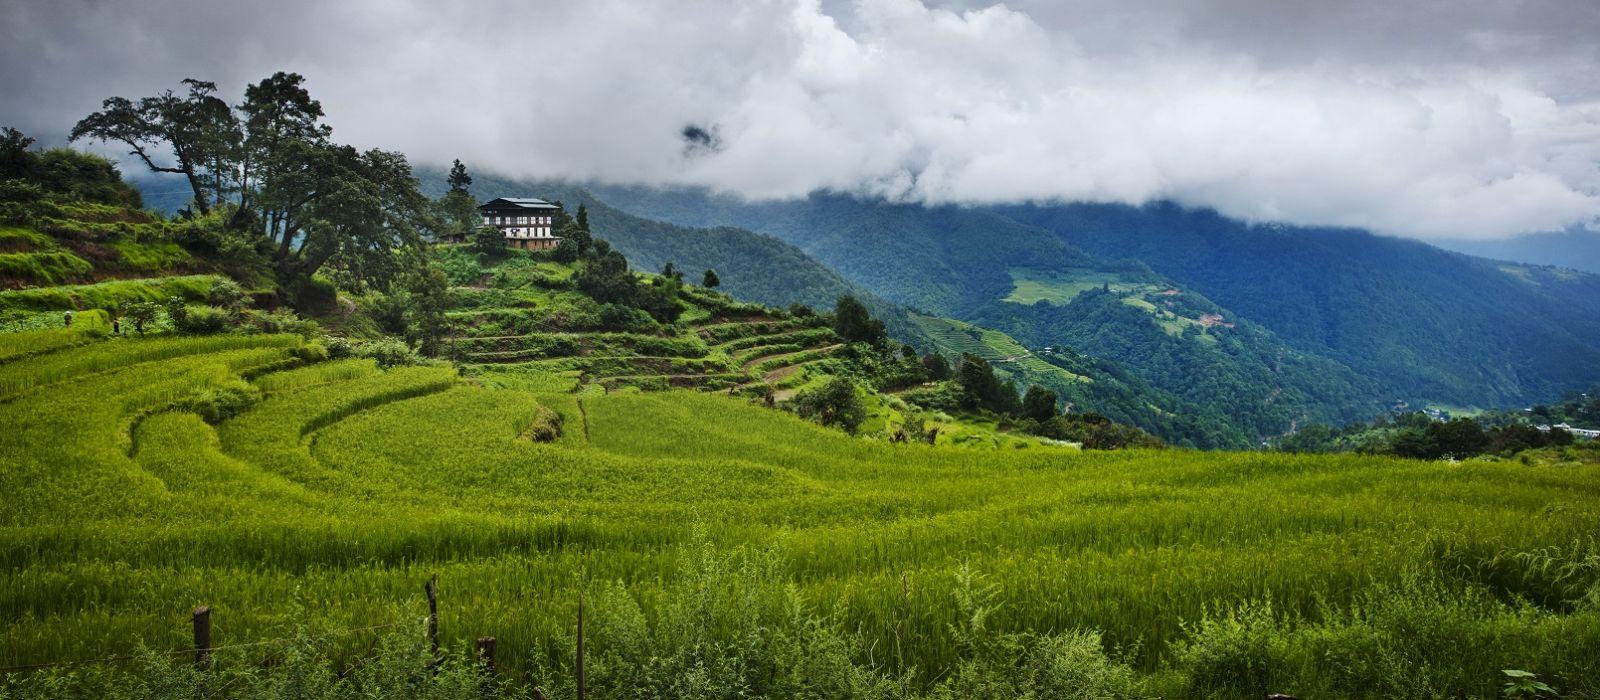 Luxury Bhutan and Thailand Paradise Islands Tour Trip 2